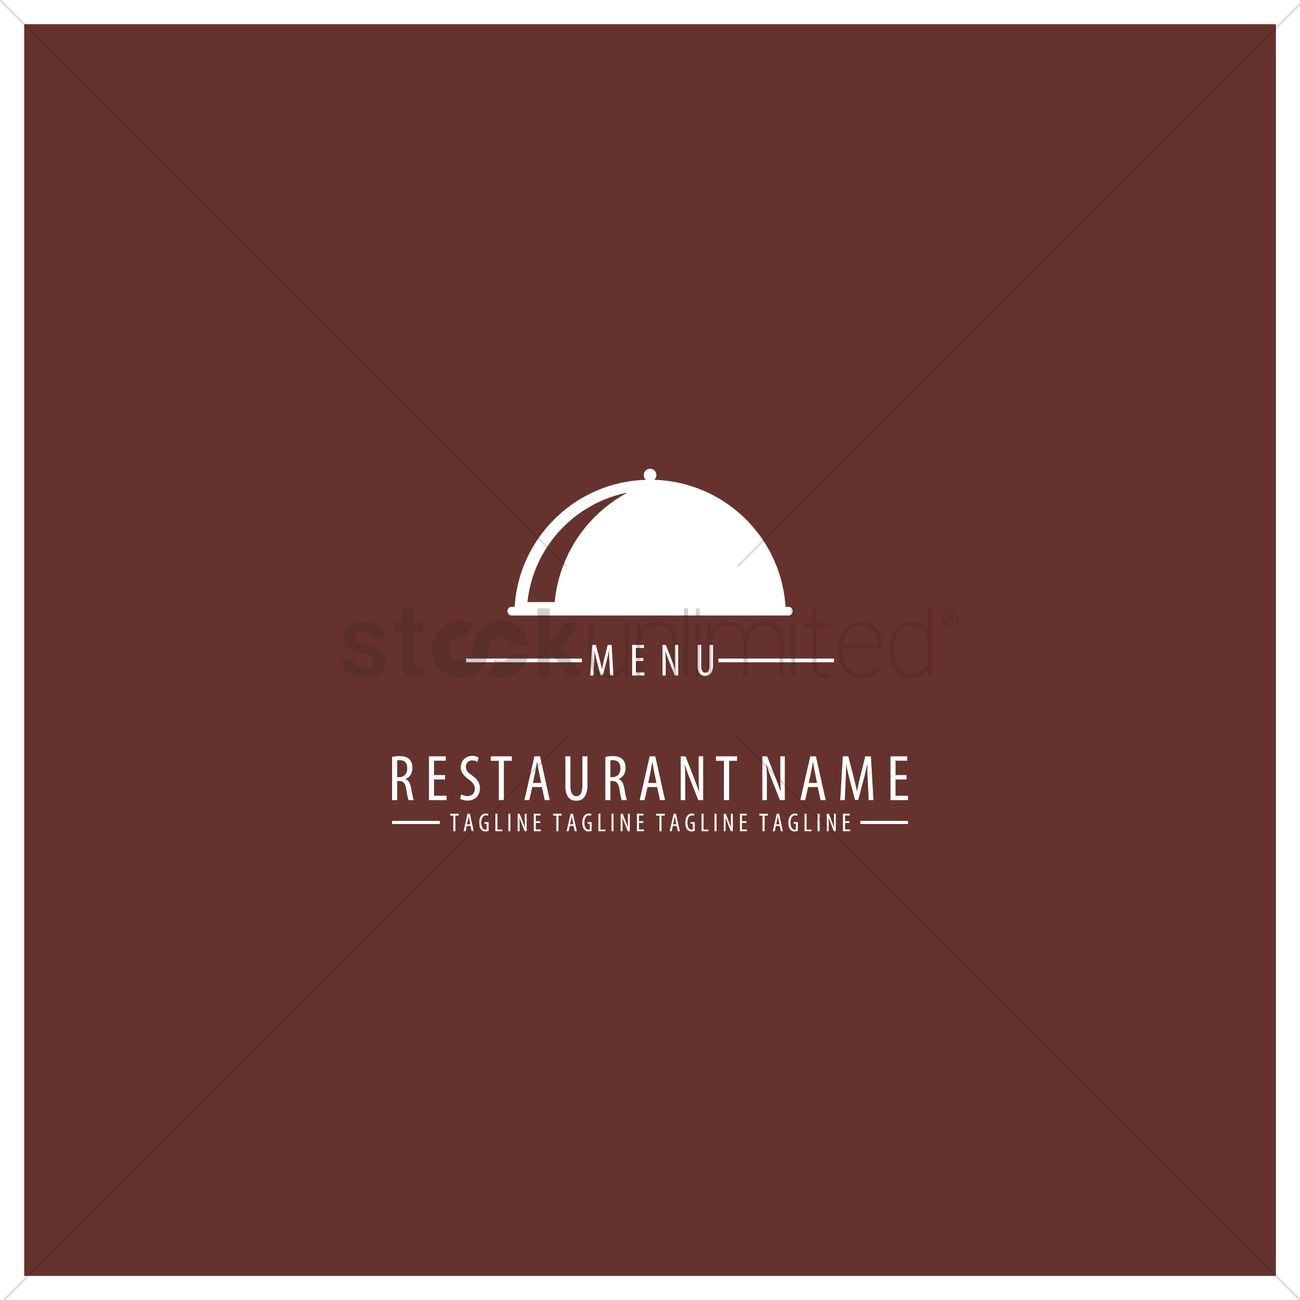 1300x1300 Restaurant Menu Vector Image